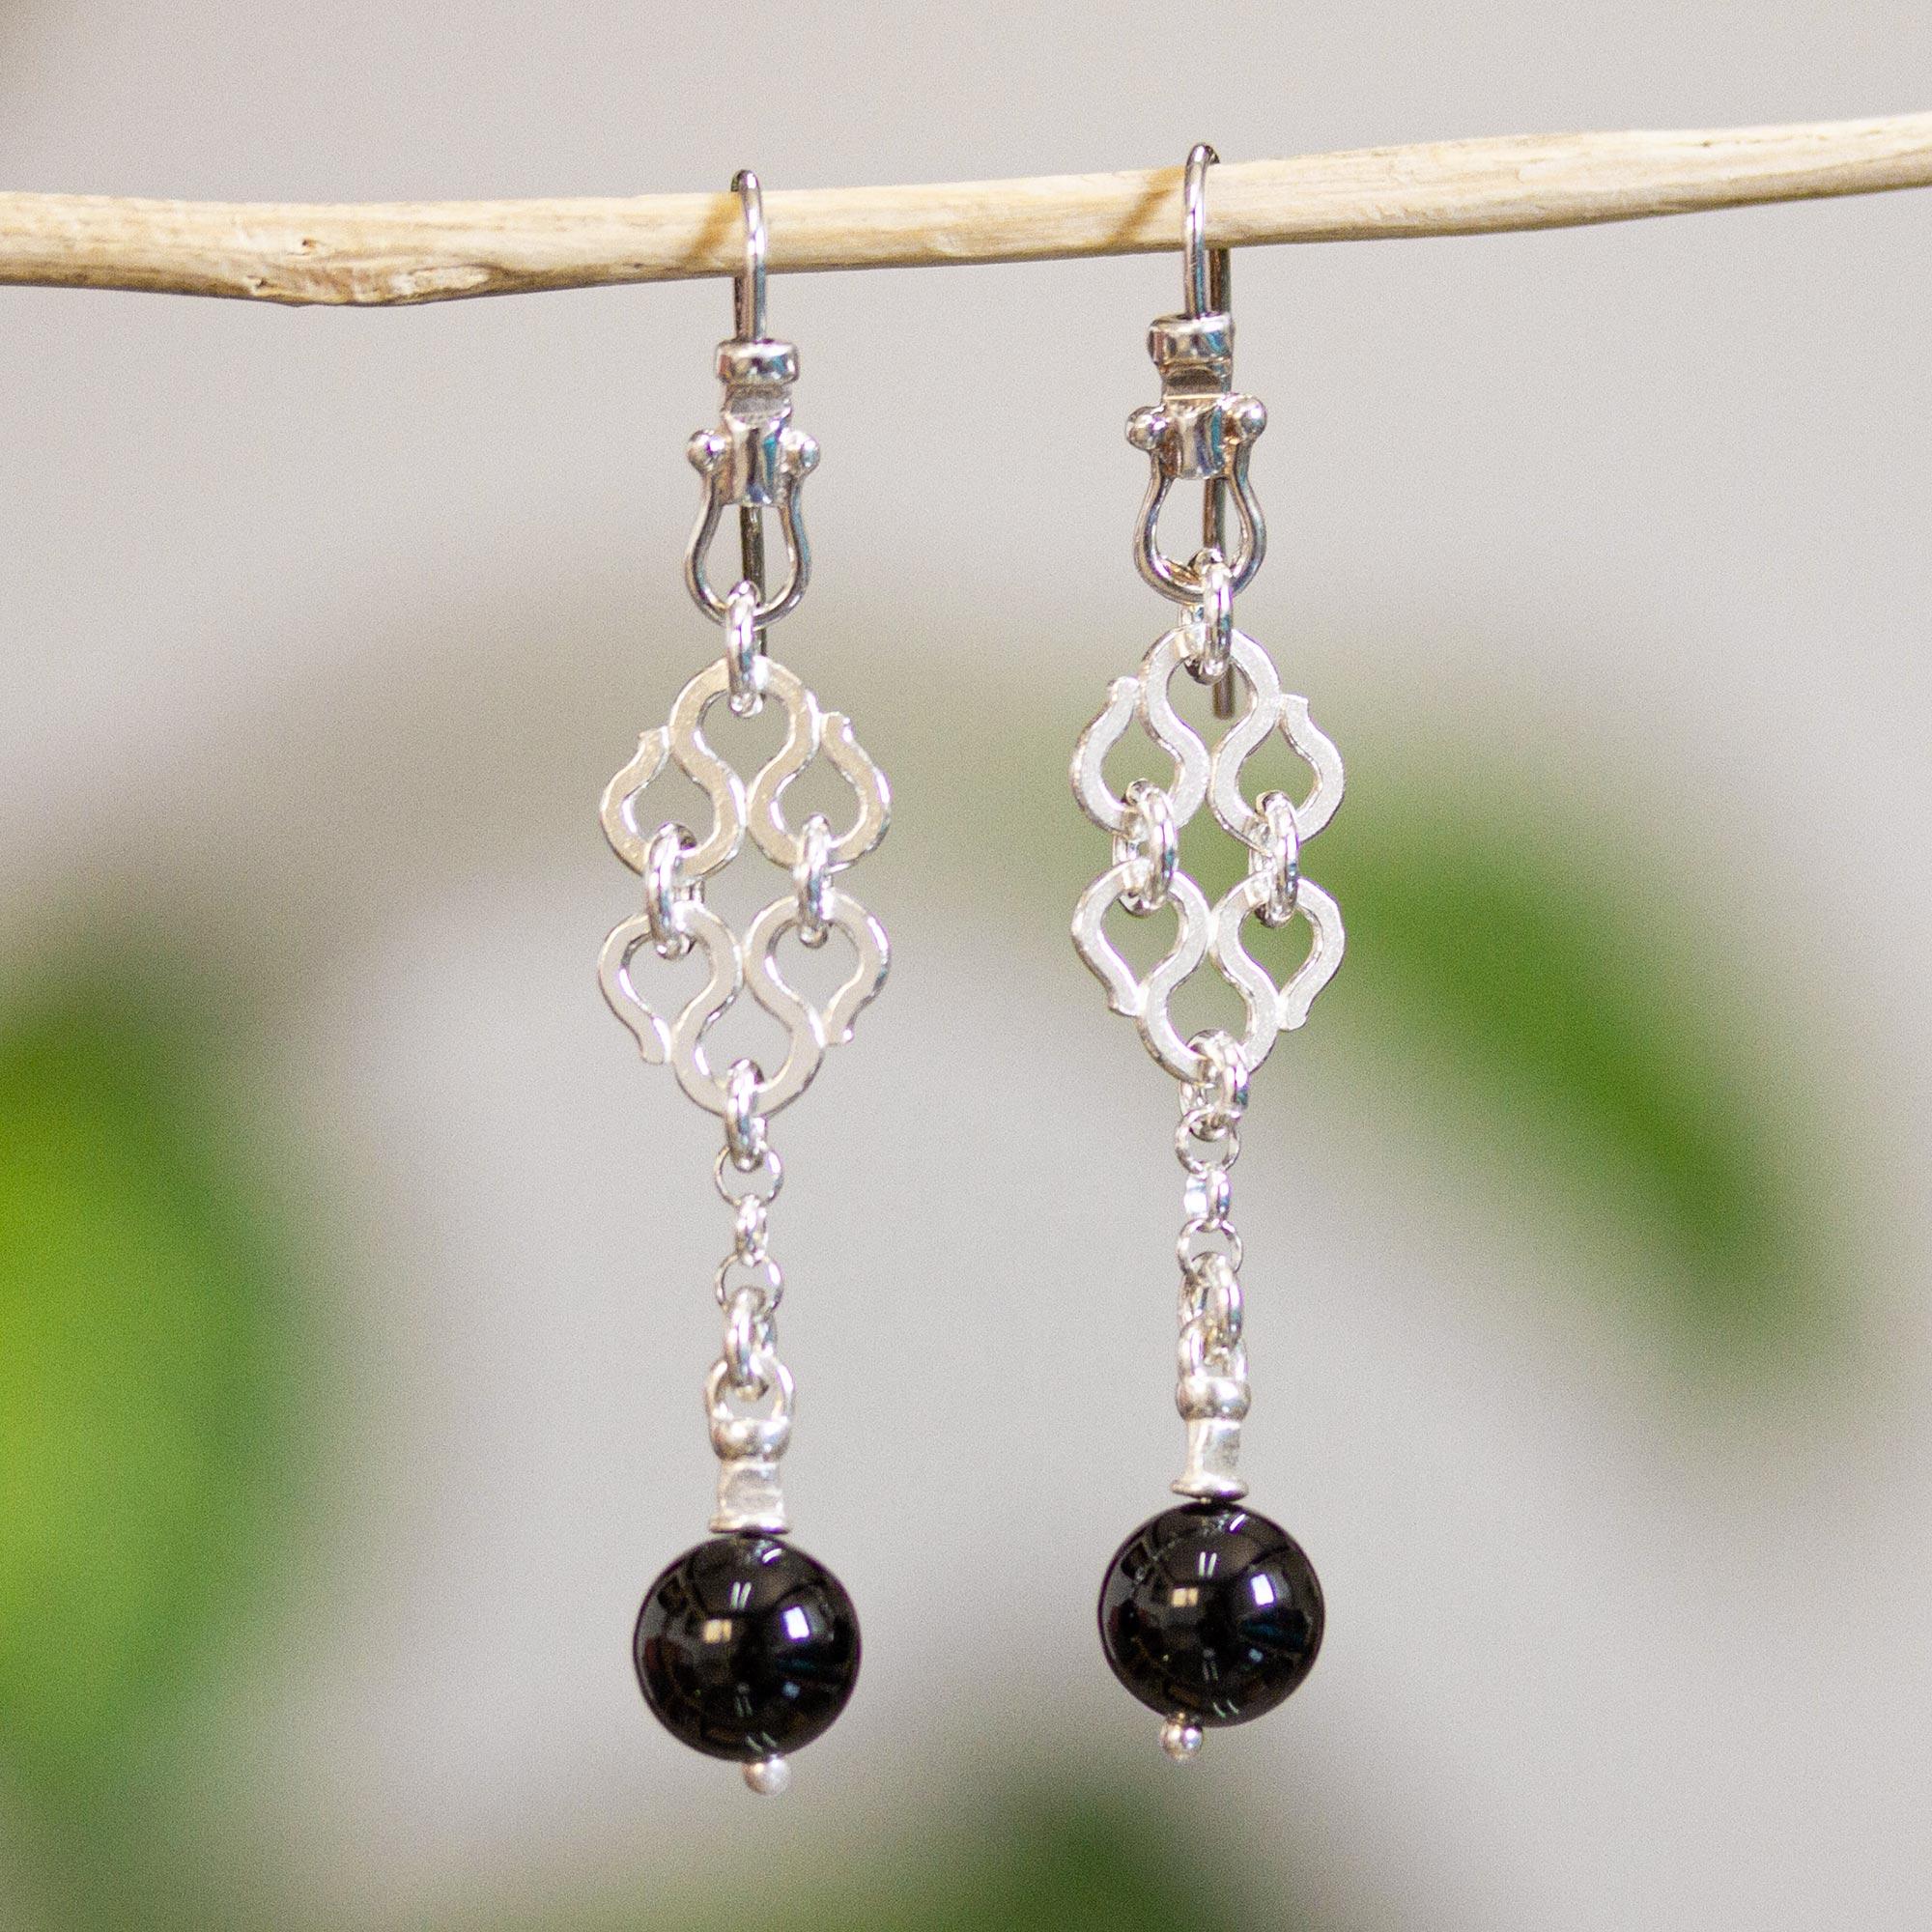 unicef uk market handmade taxco silver dangle earrings